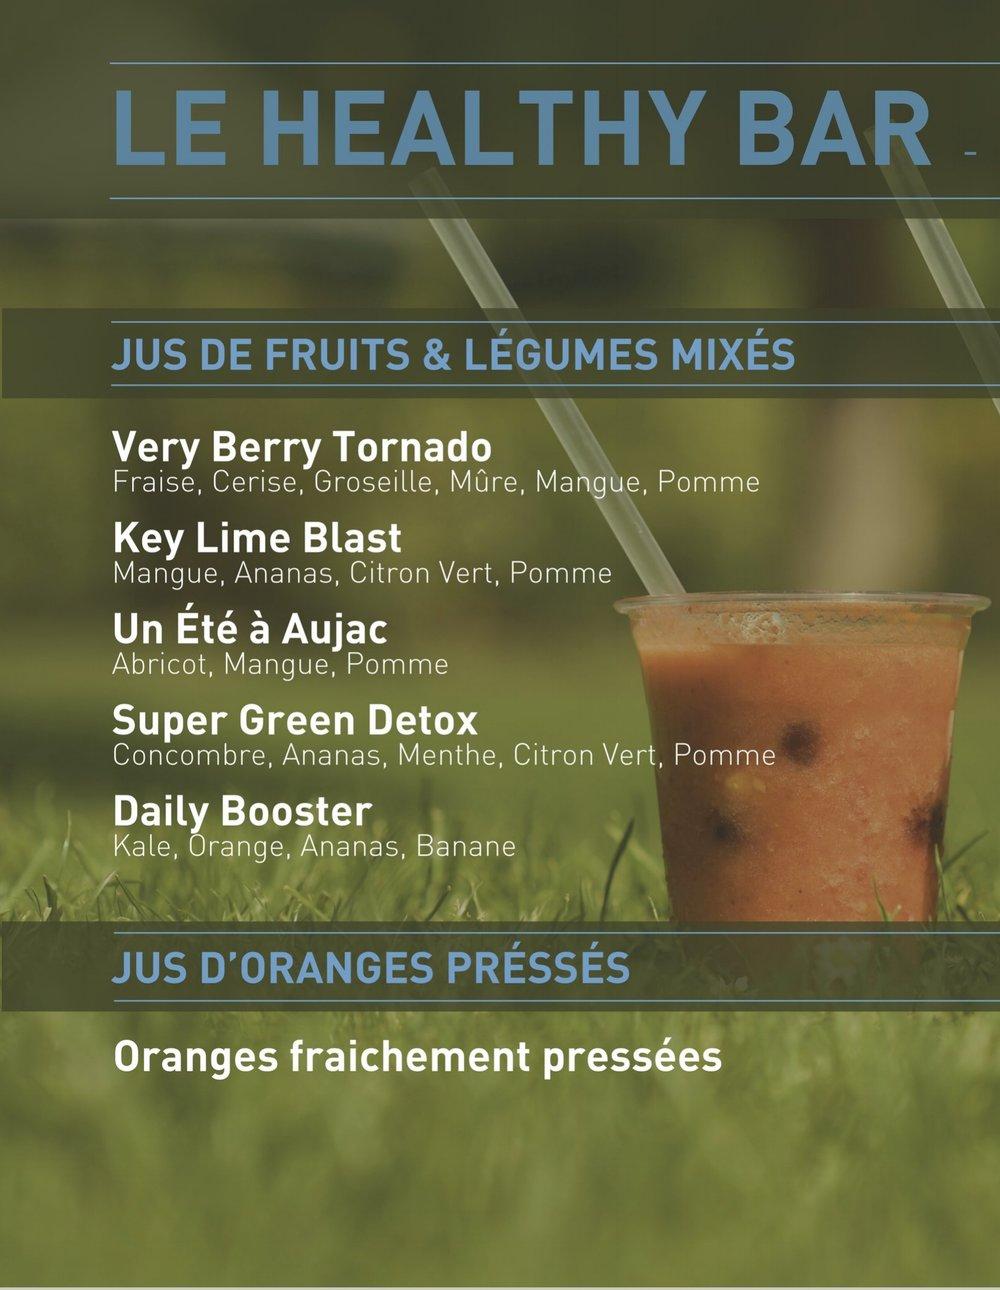 Heathy Bar.jpg